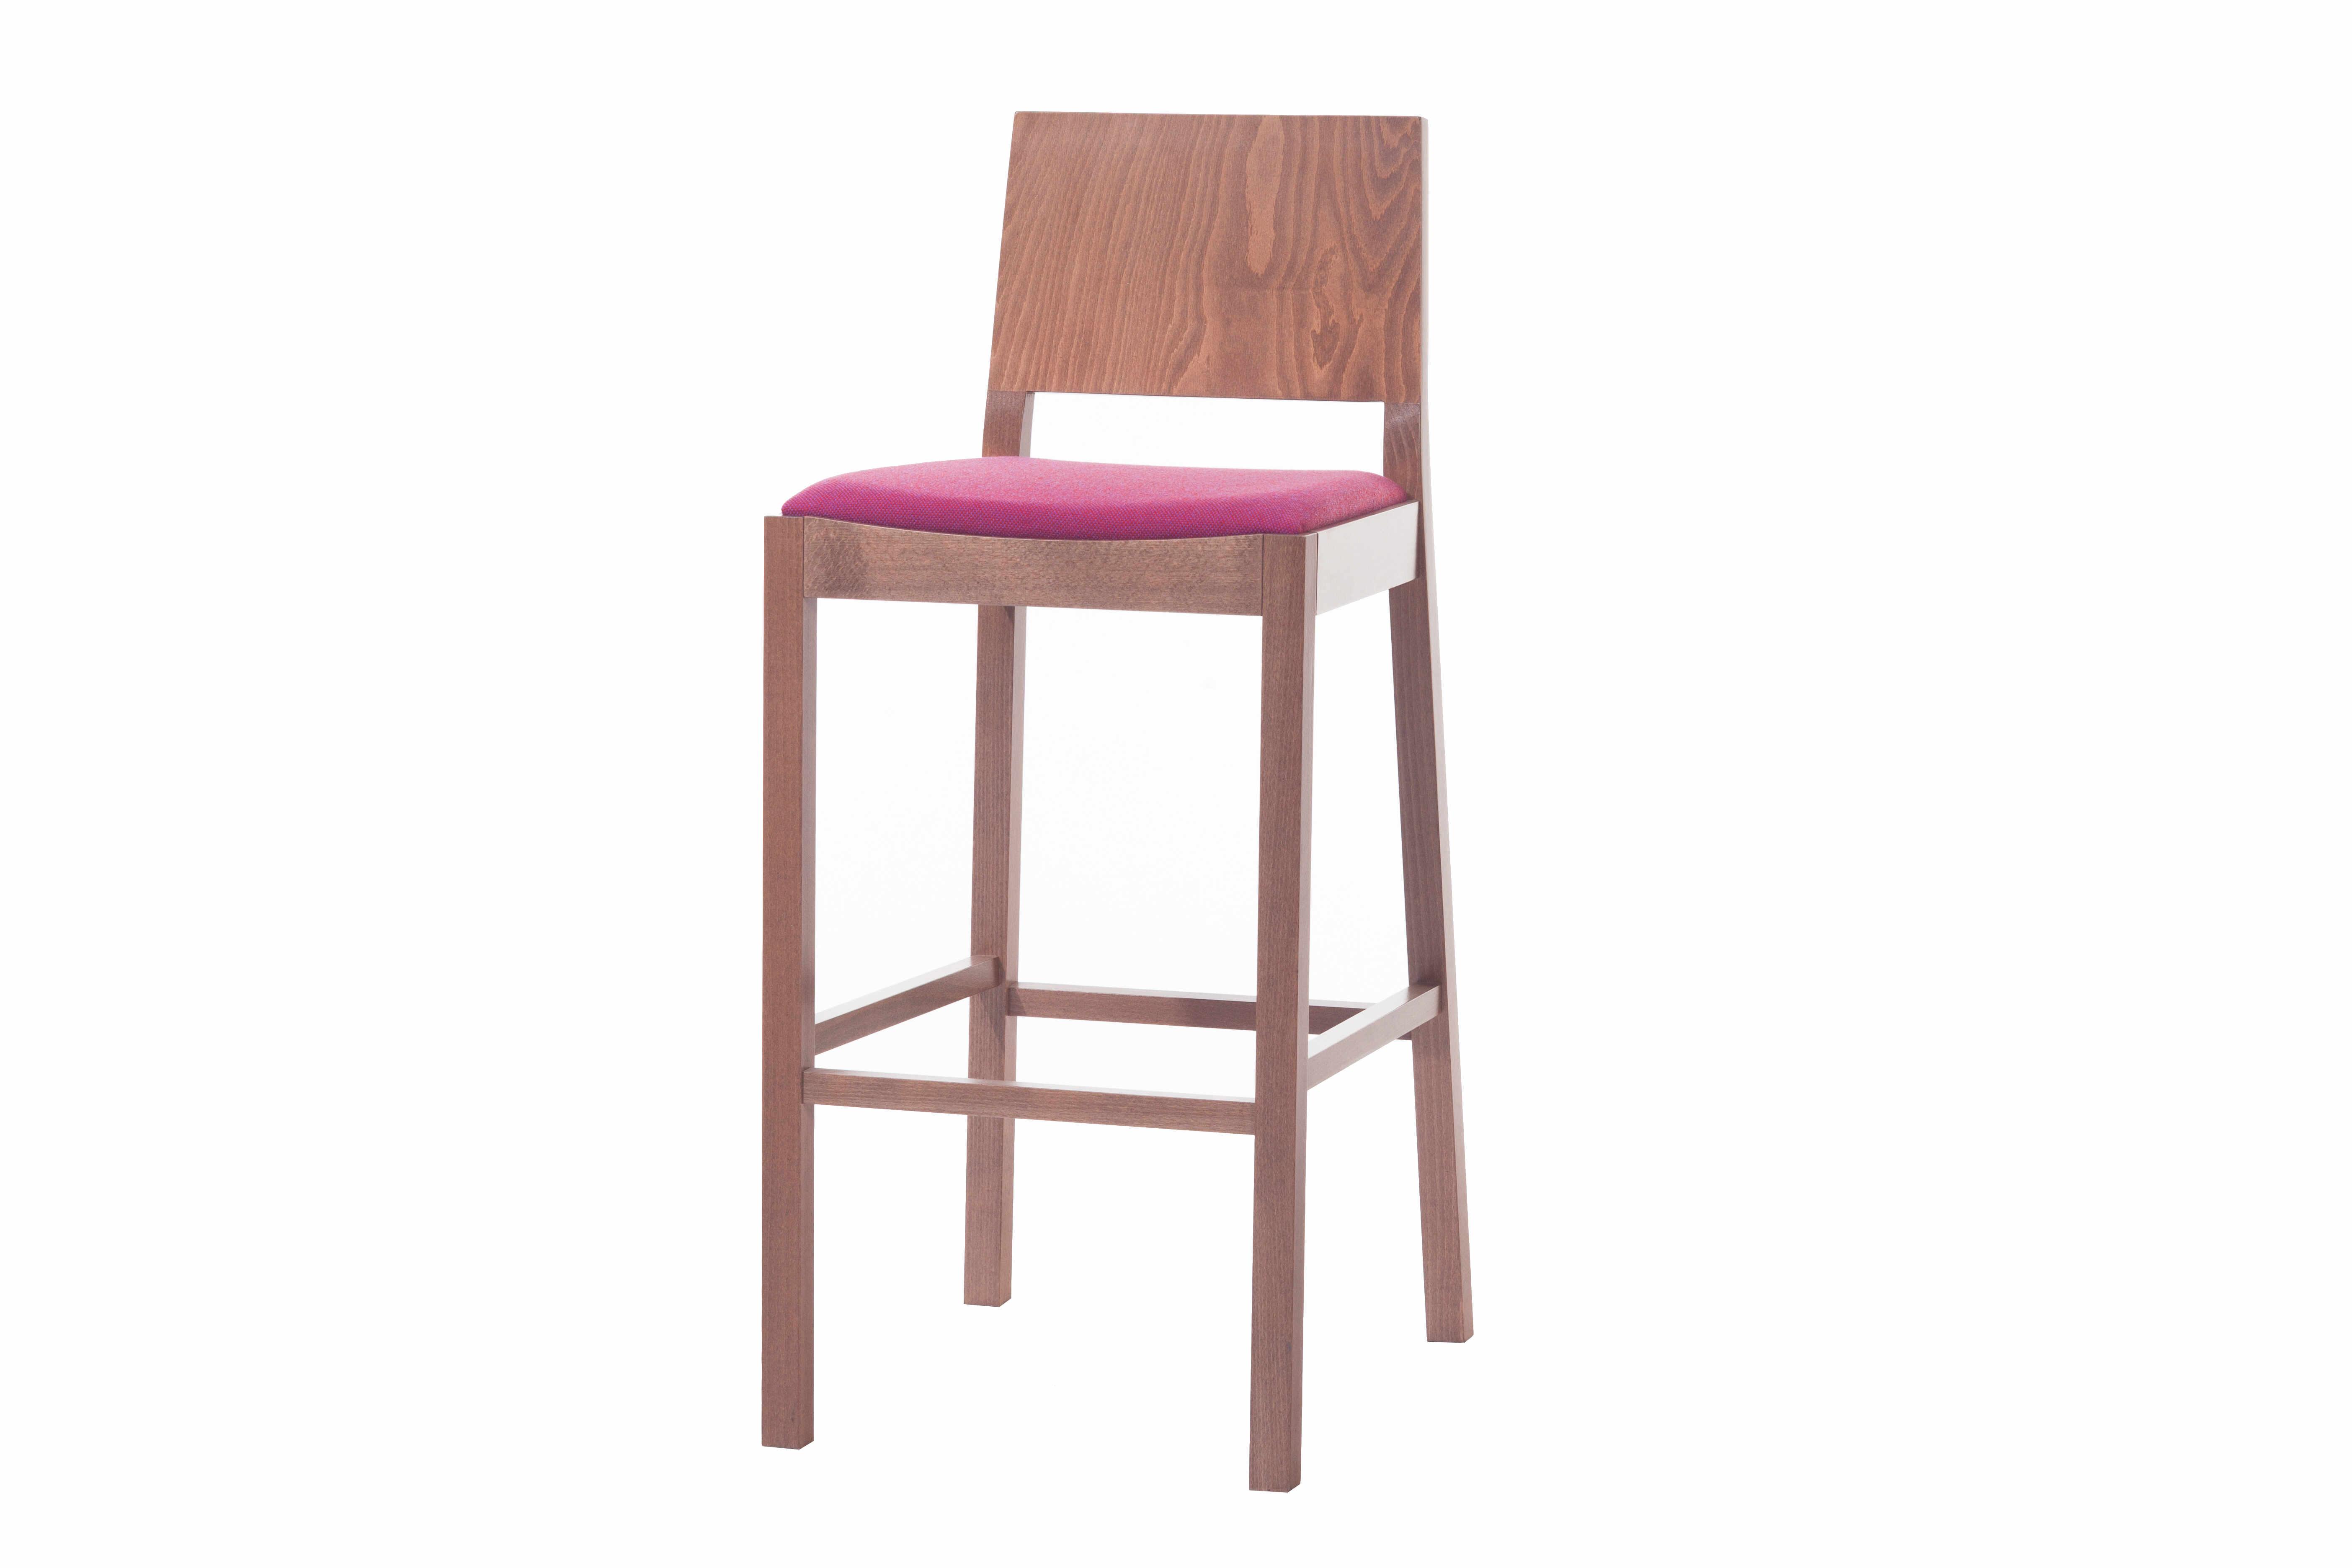 Scaun de bar din lemn de fag, tapitat cu stofa Lyon Walnut / Pink 515, l44xA53xH102 cm la pret 2279 lei